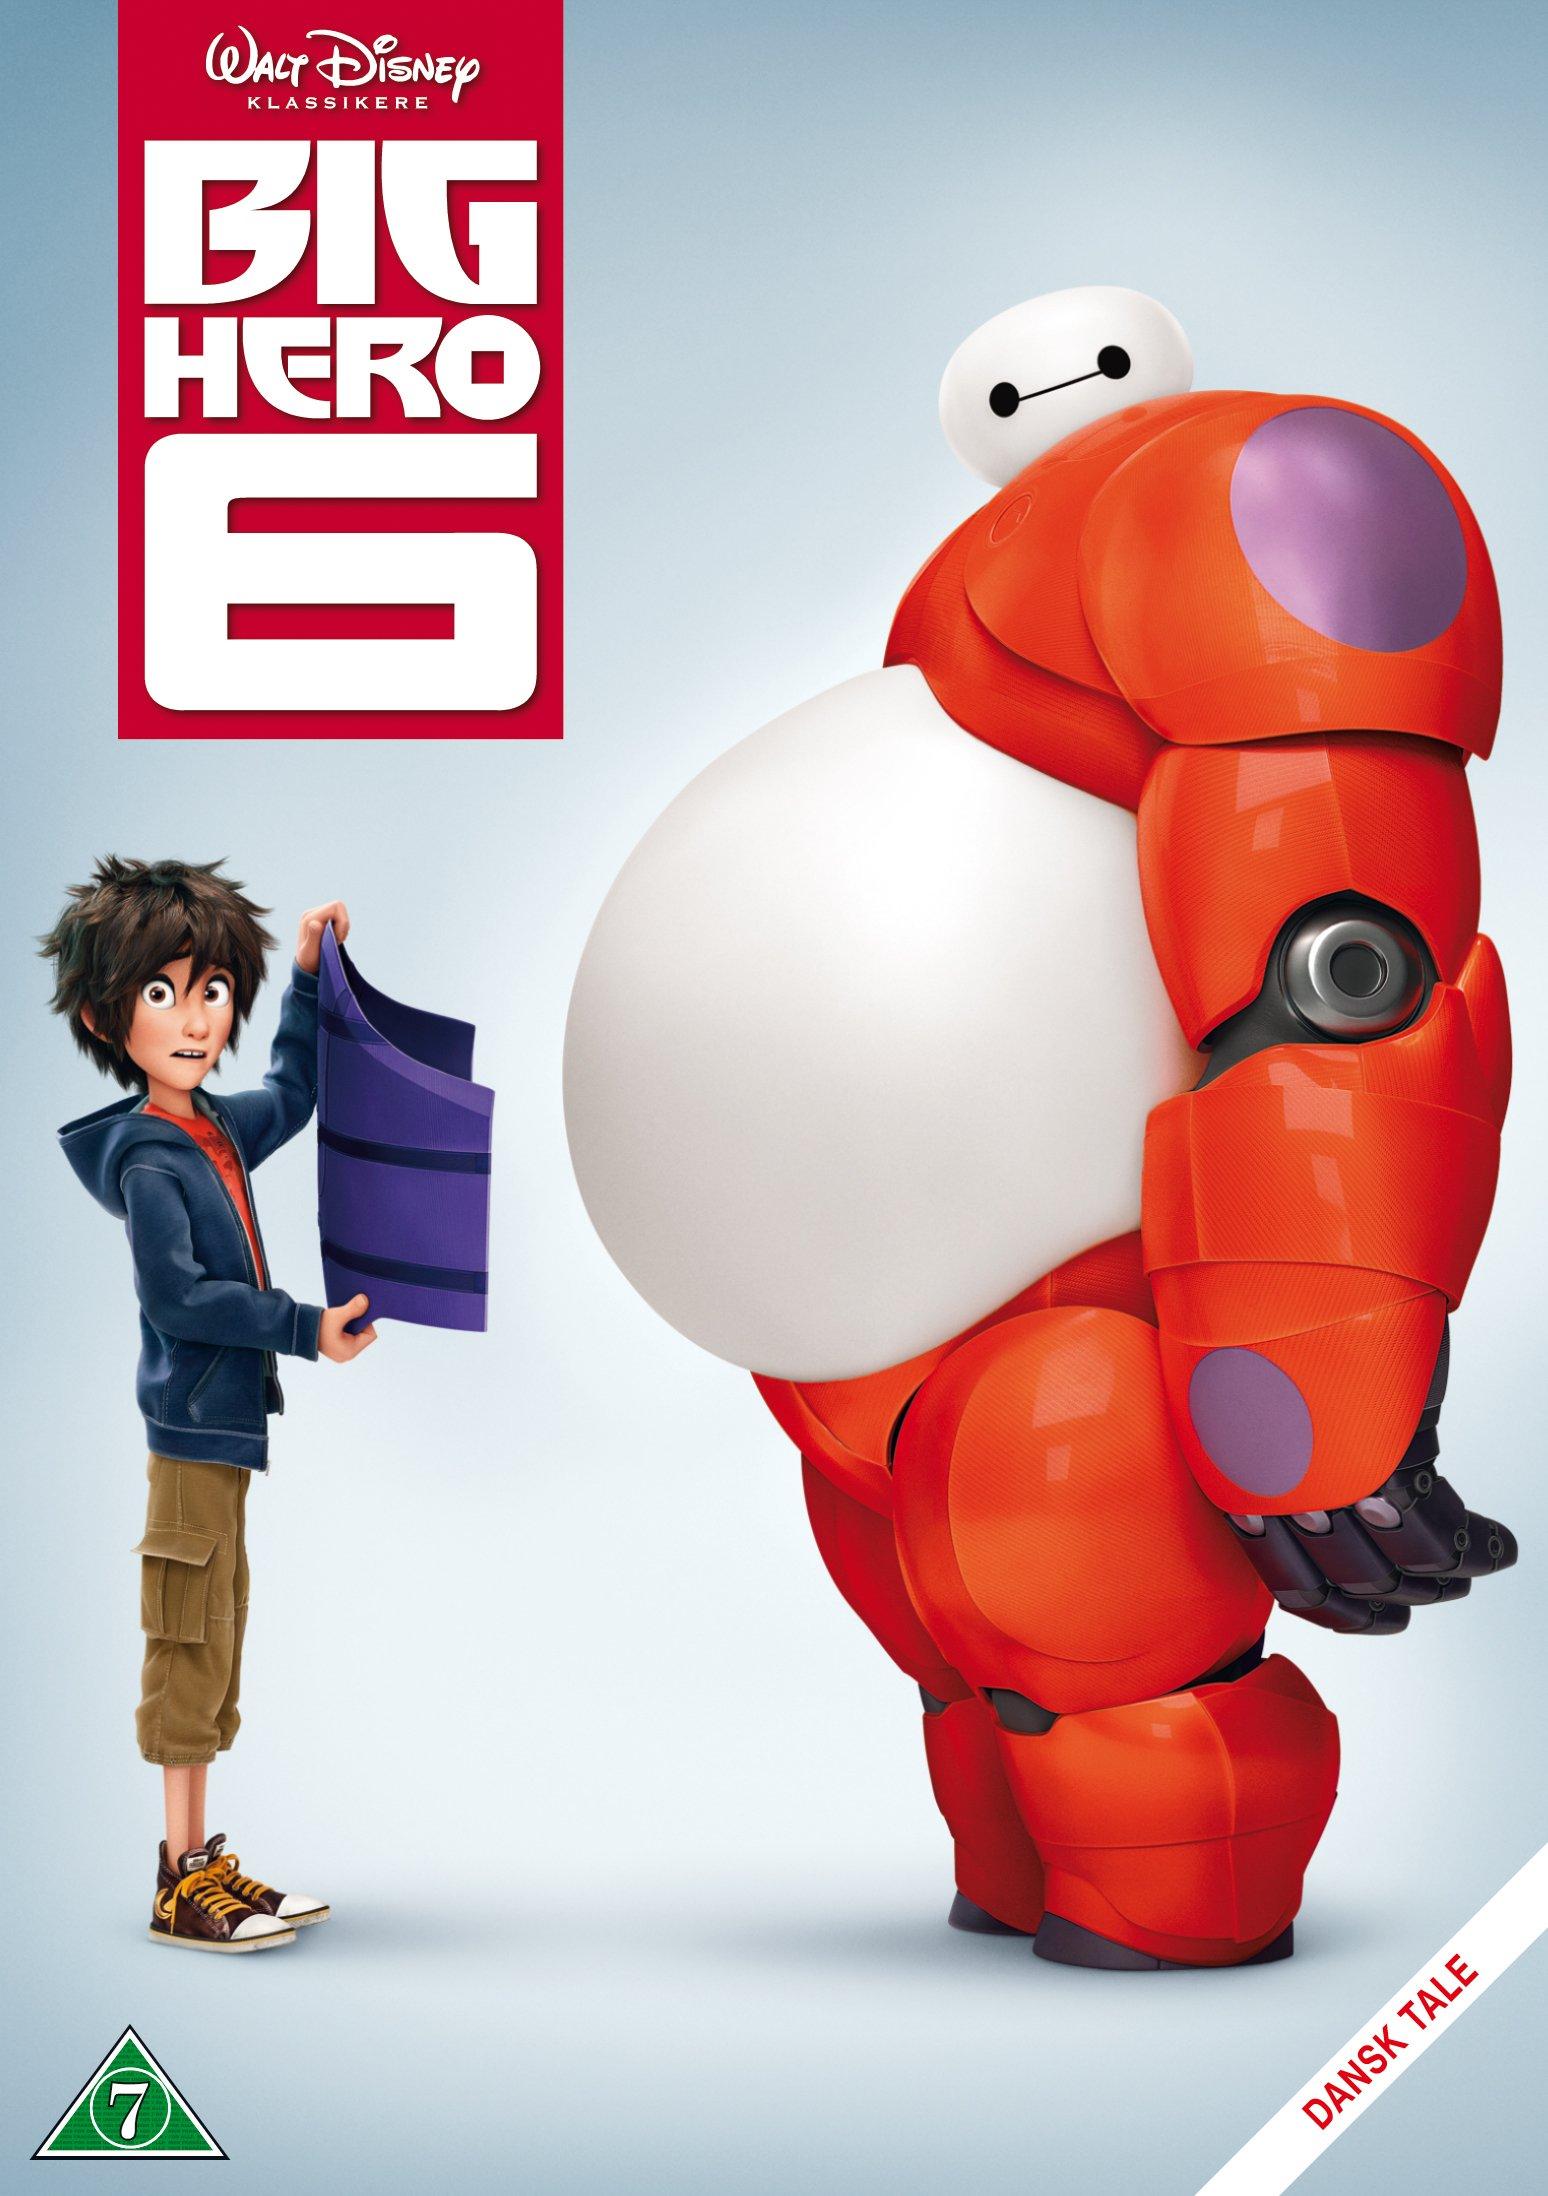 Big Hero 6 Disney classic #53